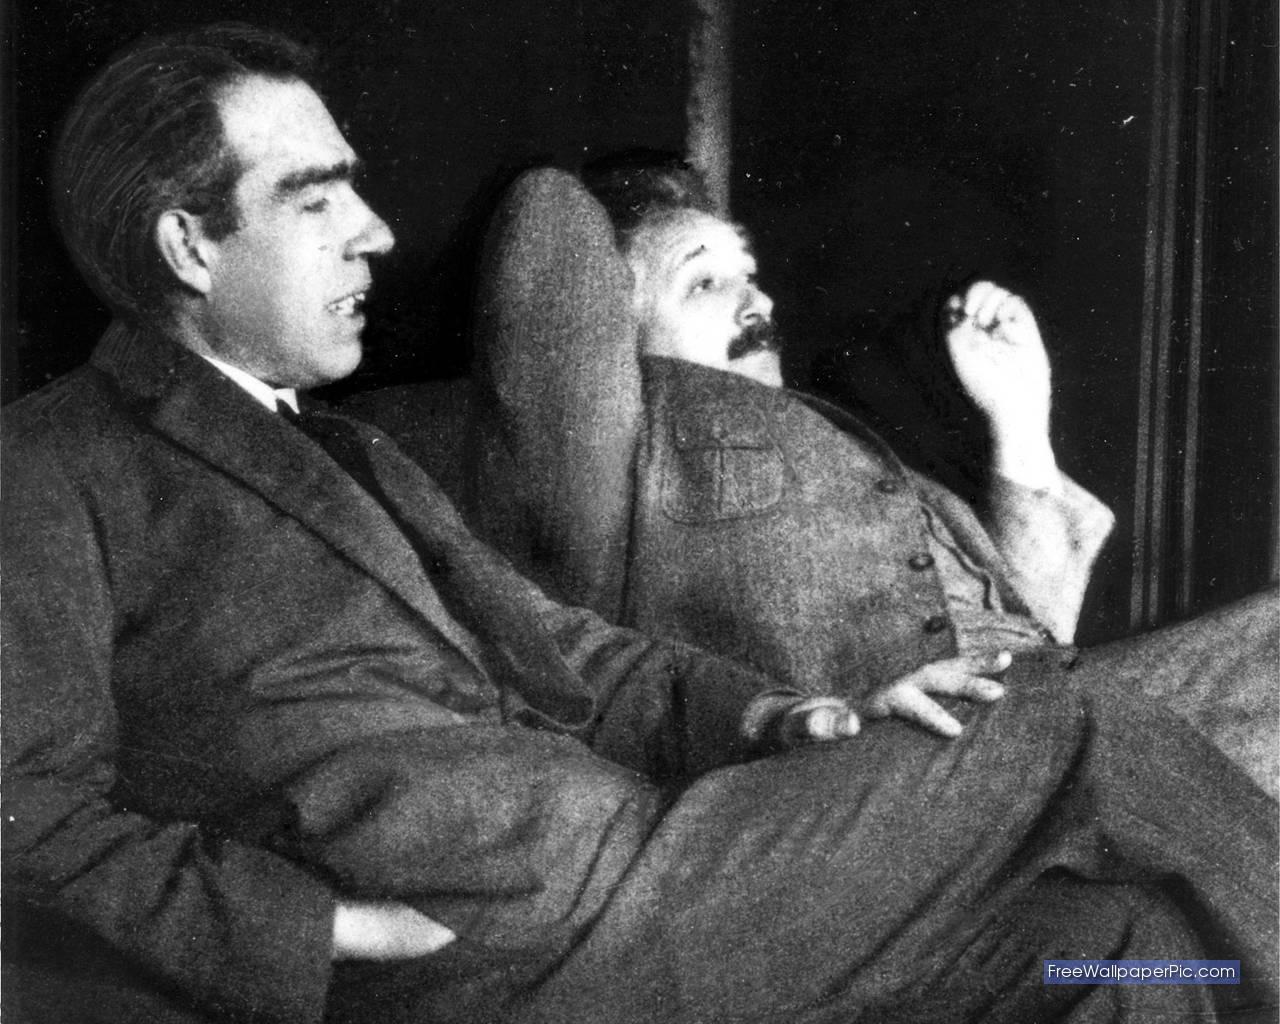 http://2.bp.blogspot.com/-g5EdbzbgaXM/TbWx7yNBRzI/AAAAAAAAAfY/BWqrGhk24fM/s1600/Niels+Bohr+and+Albert+Einstein%252C+1925.jpg